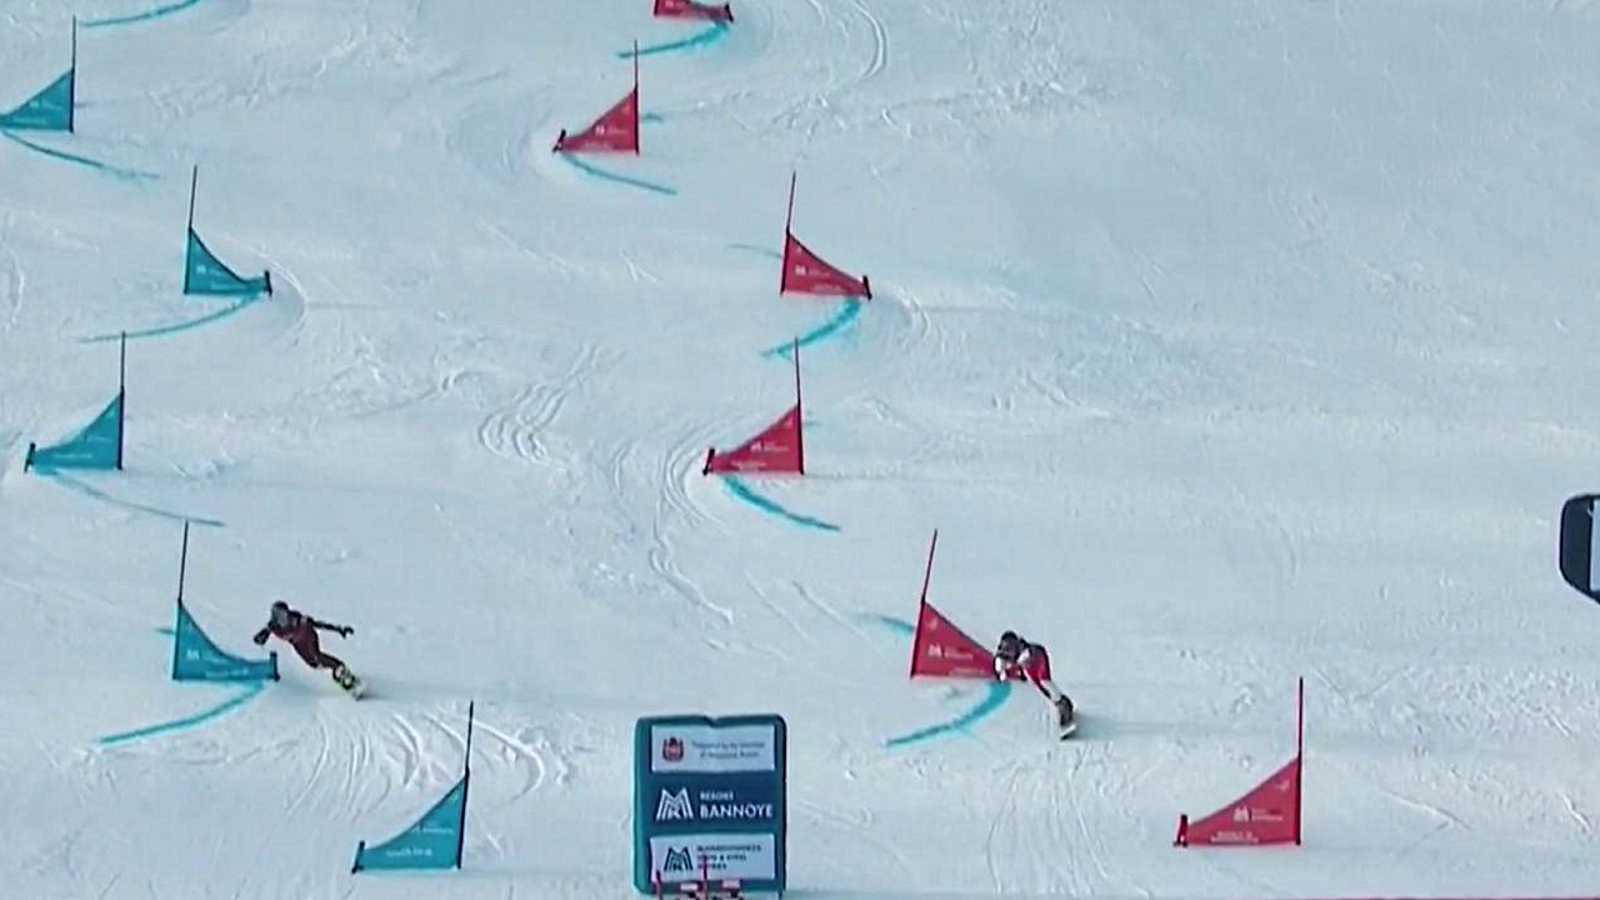 Snowboard - FIS Snowboard Copa del mundo magazine - Programa 1 - ver ahora